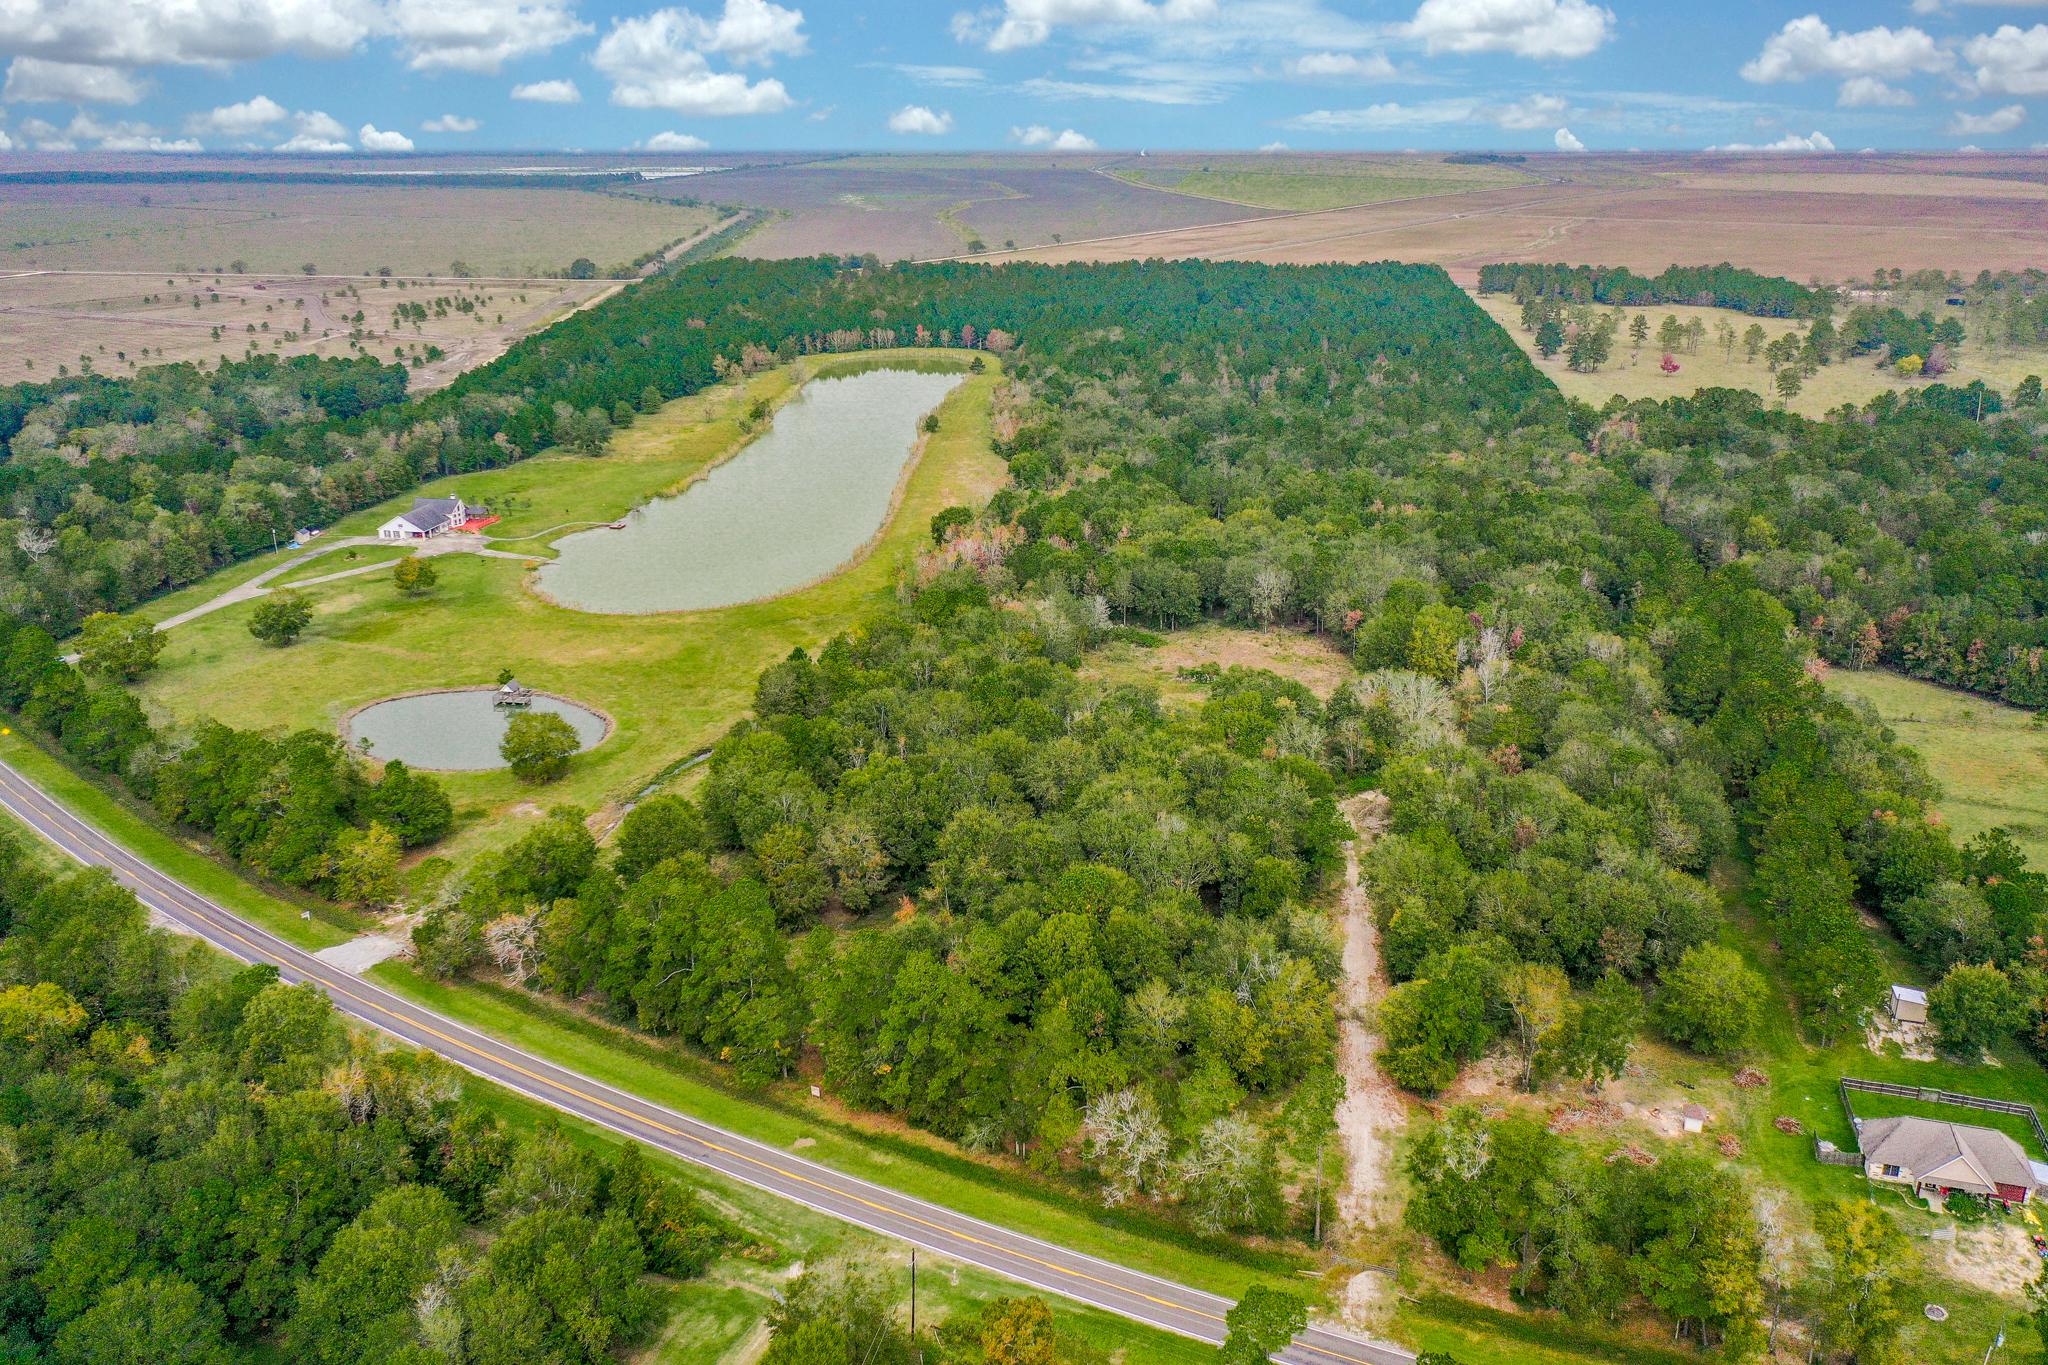 Jefferson County Development Land - Image 4 of 36